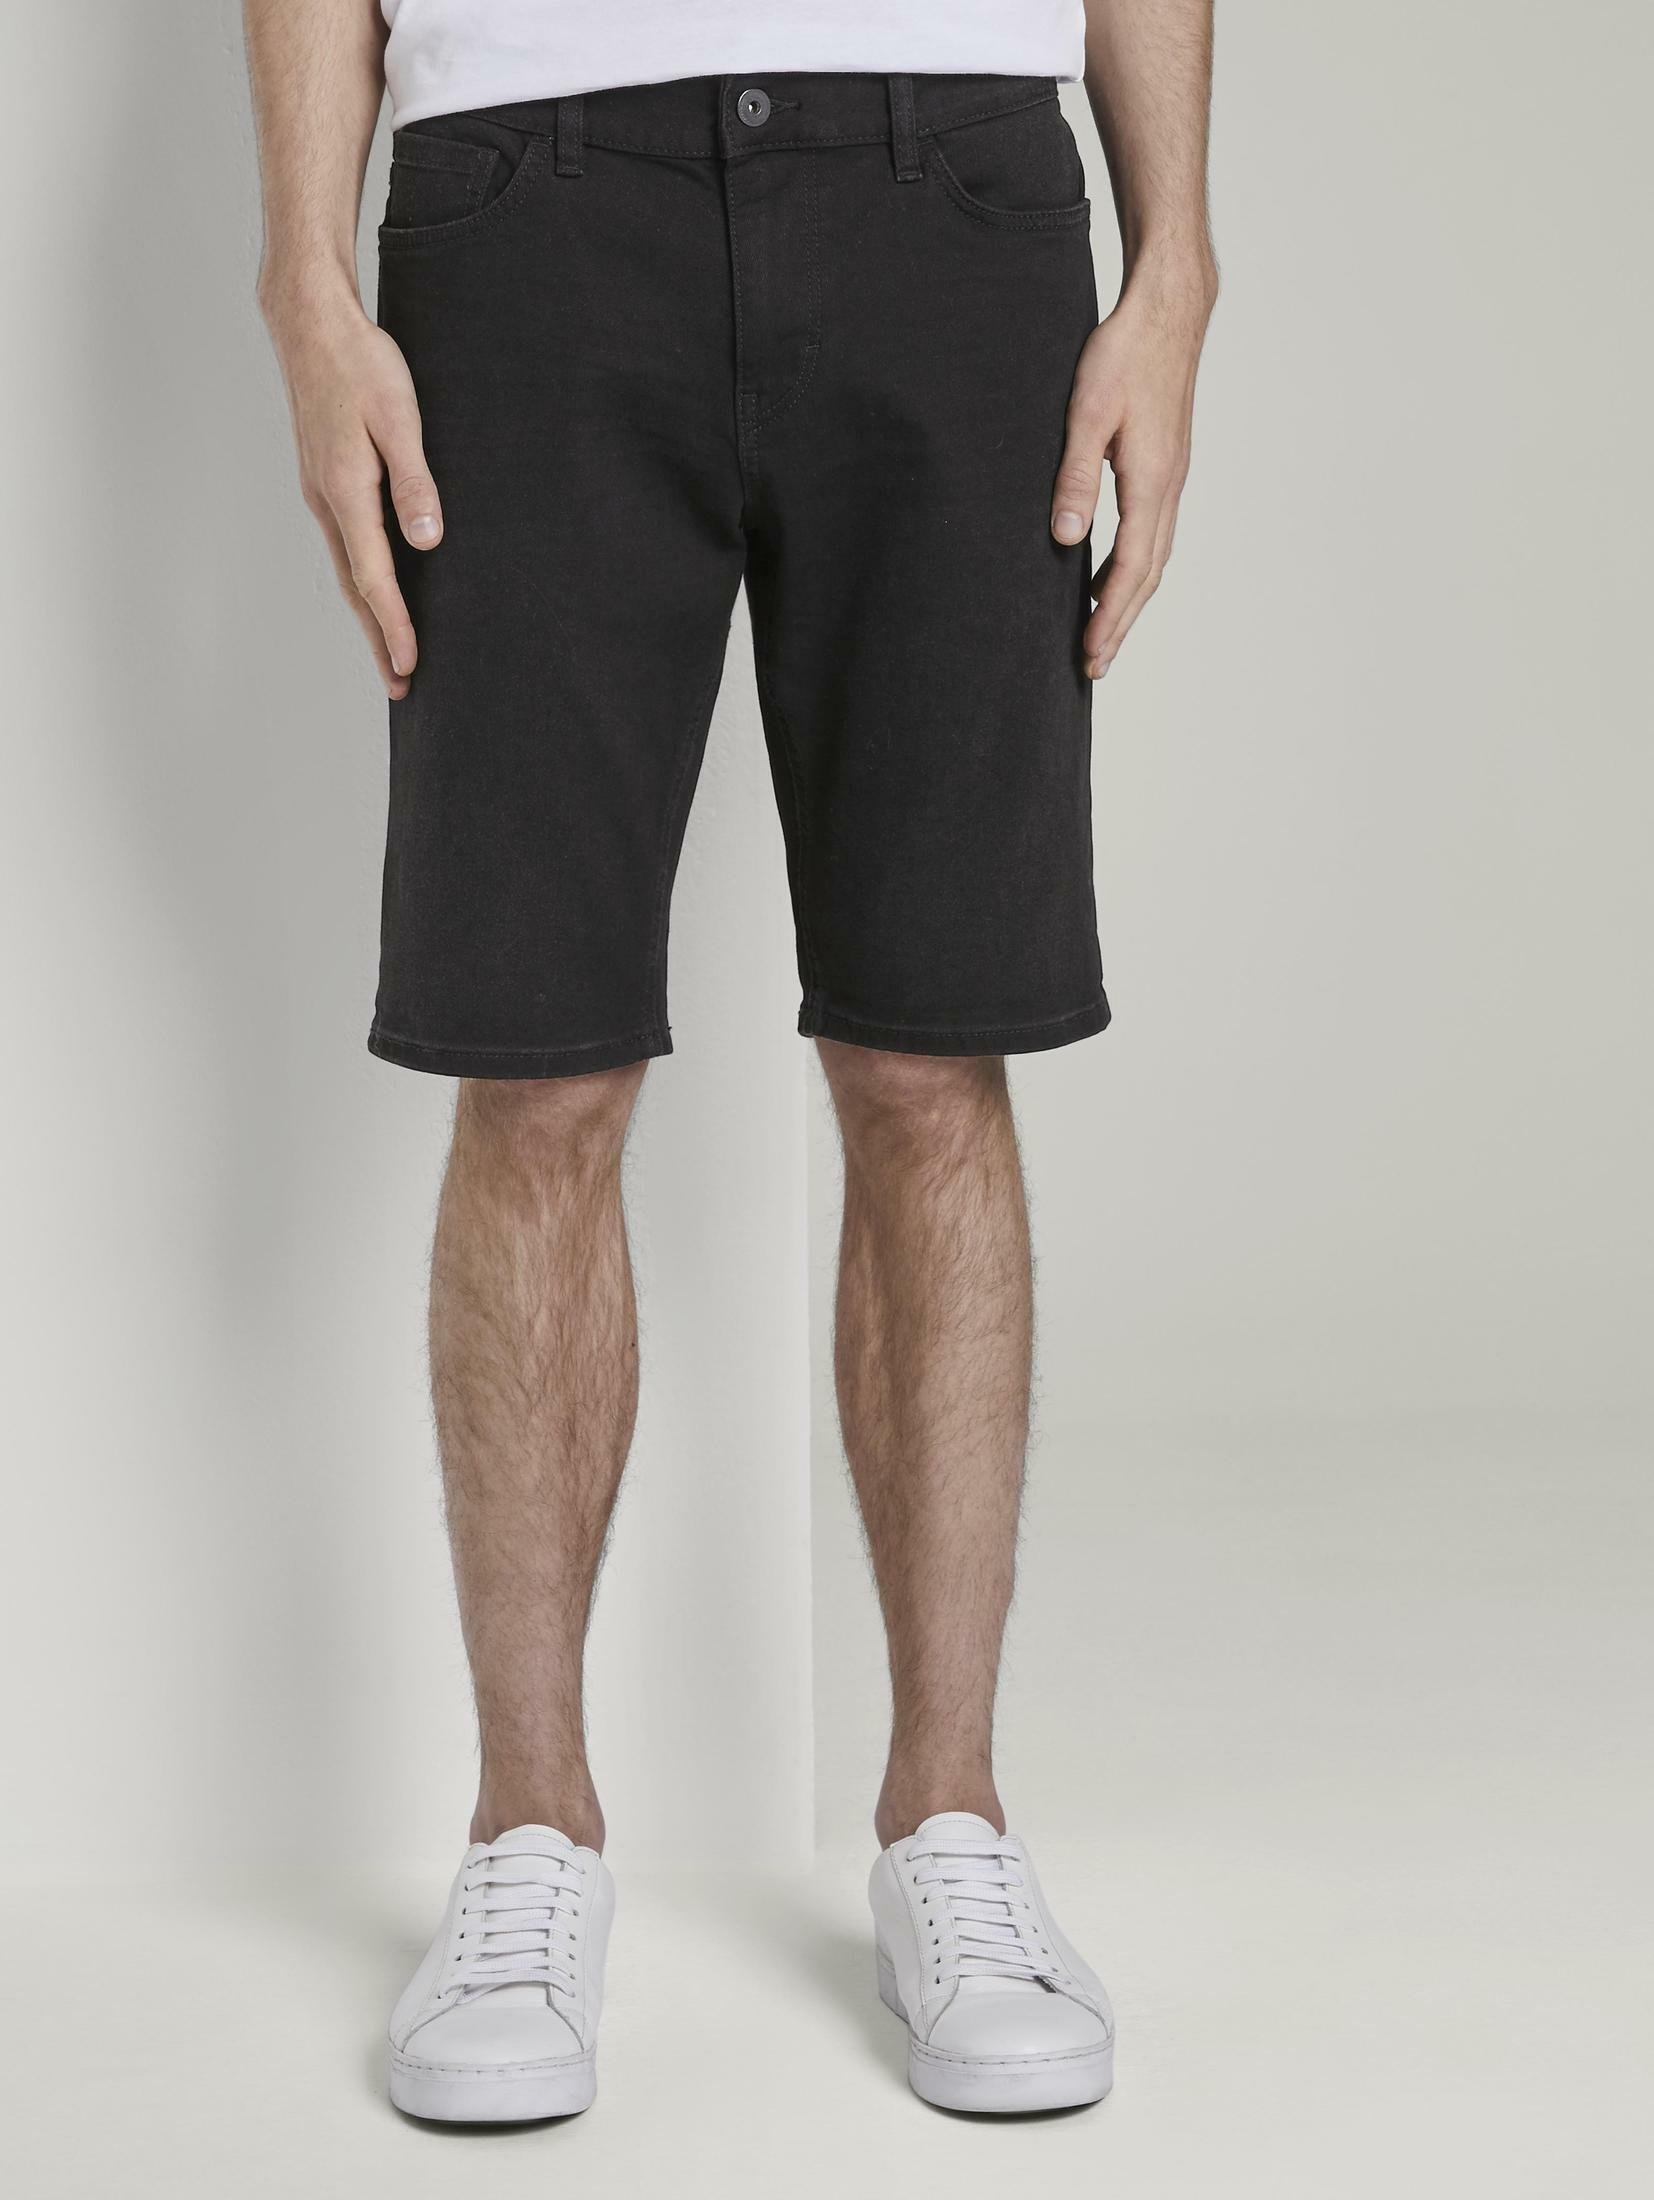 TOM TAILOR jeansshort »Josh Regular Slim Jeans-Shorts mit Superstretch« bestellen: 30 dagen bedenktijd